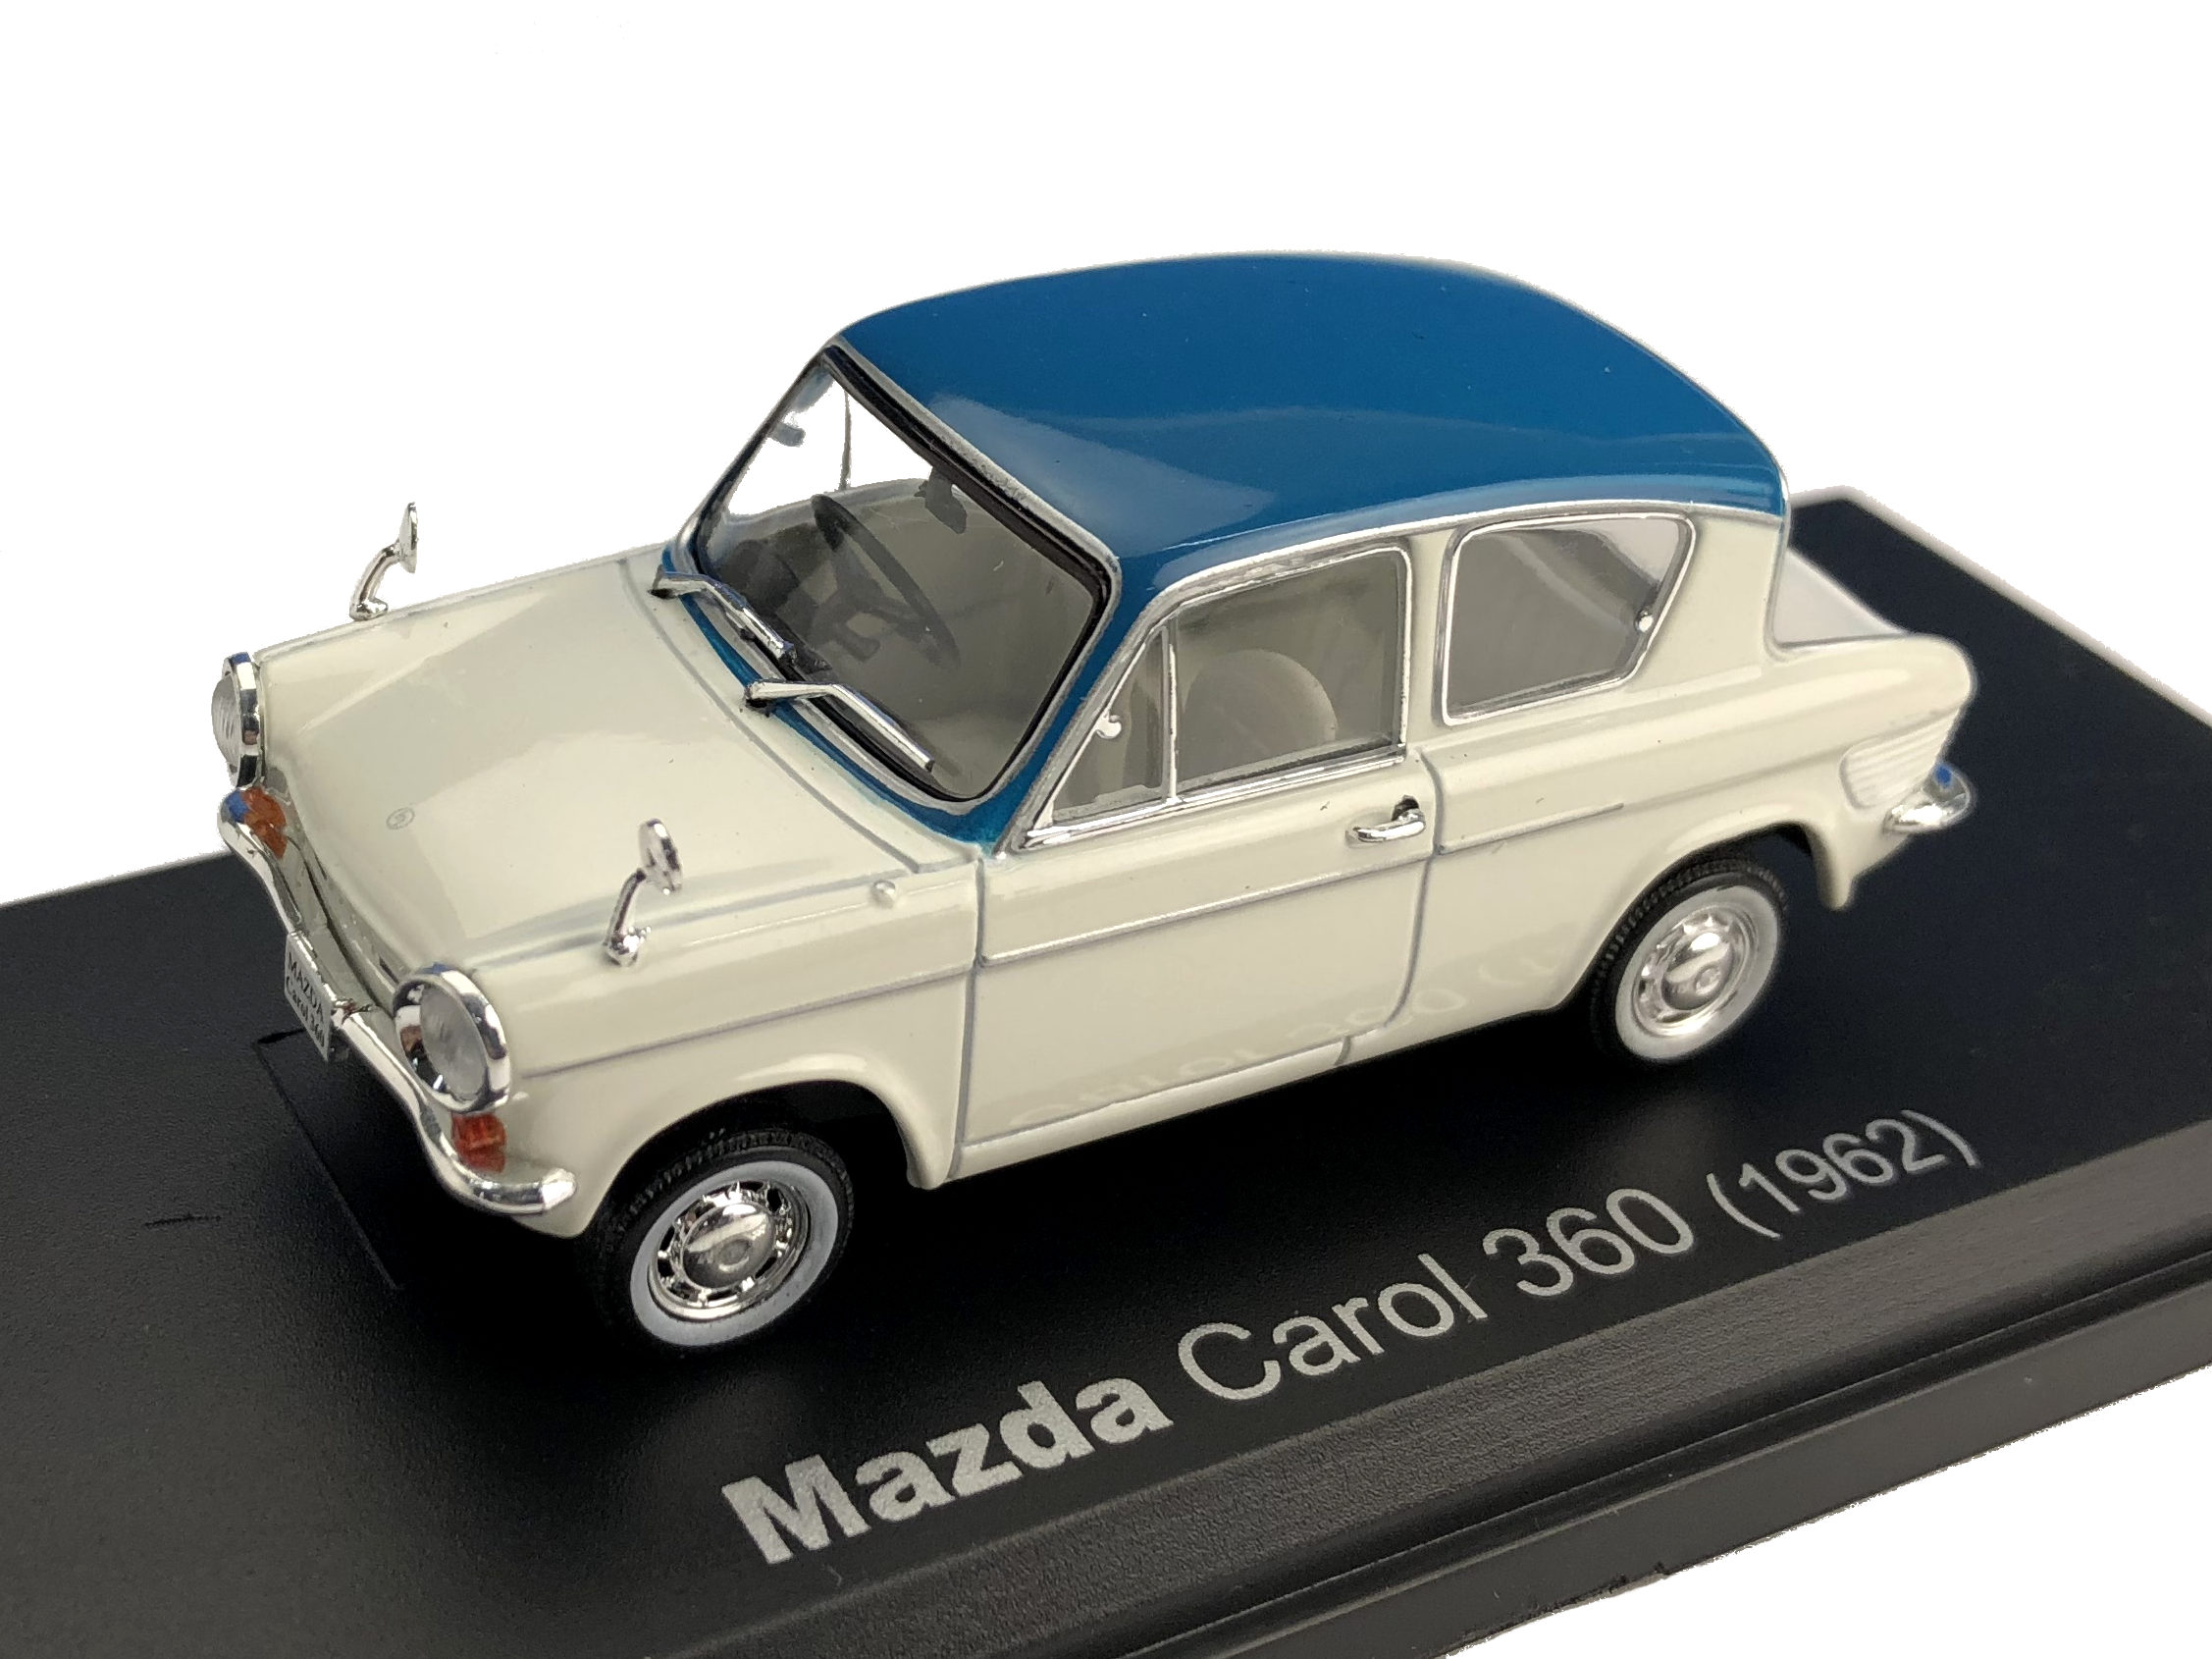 NOREV/ノレブ MAZDA CAROL 360 (KPDA) 1962年ホワイト/ブルー